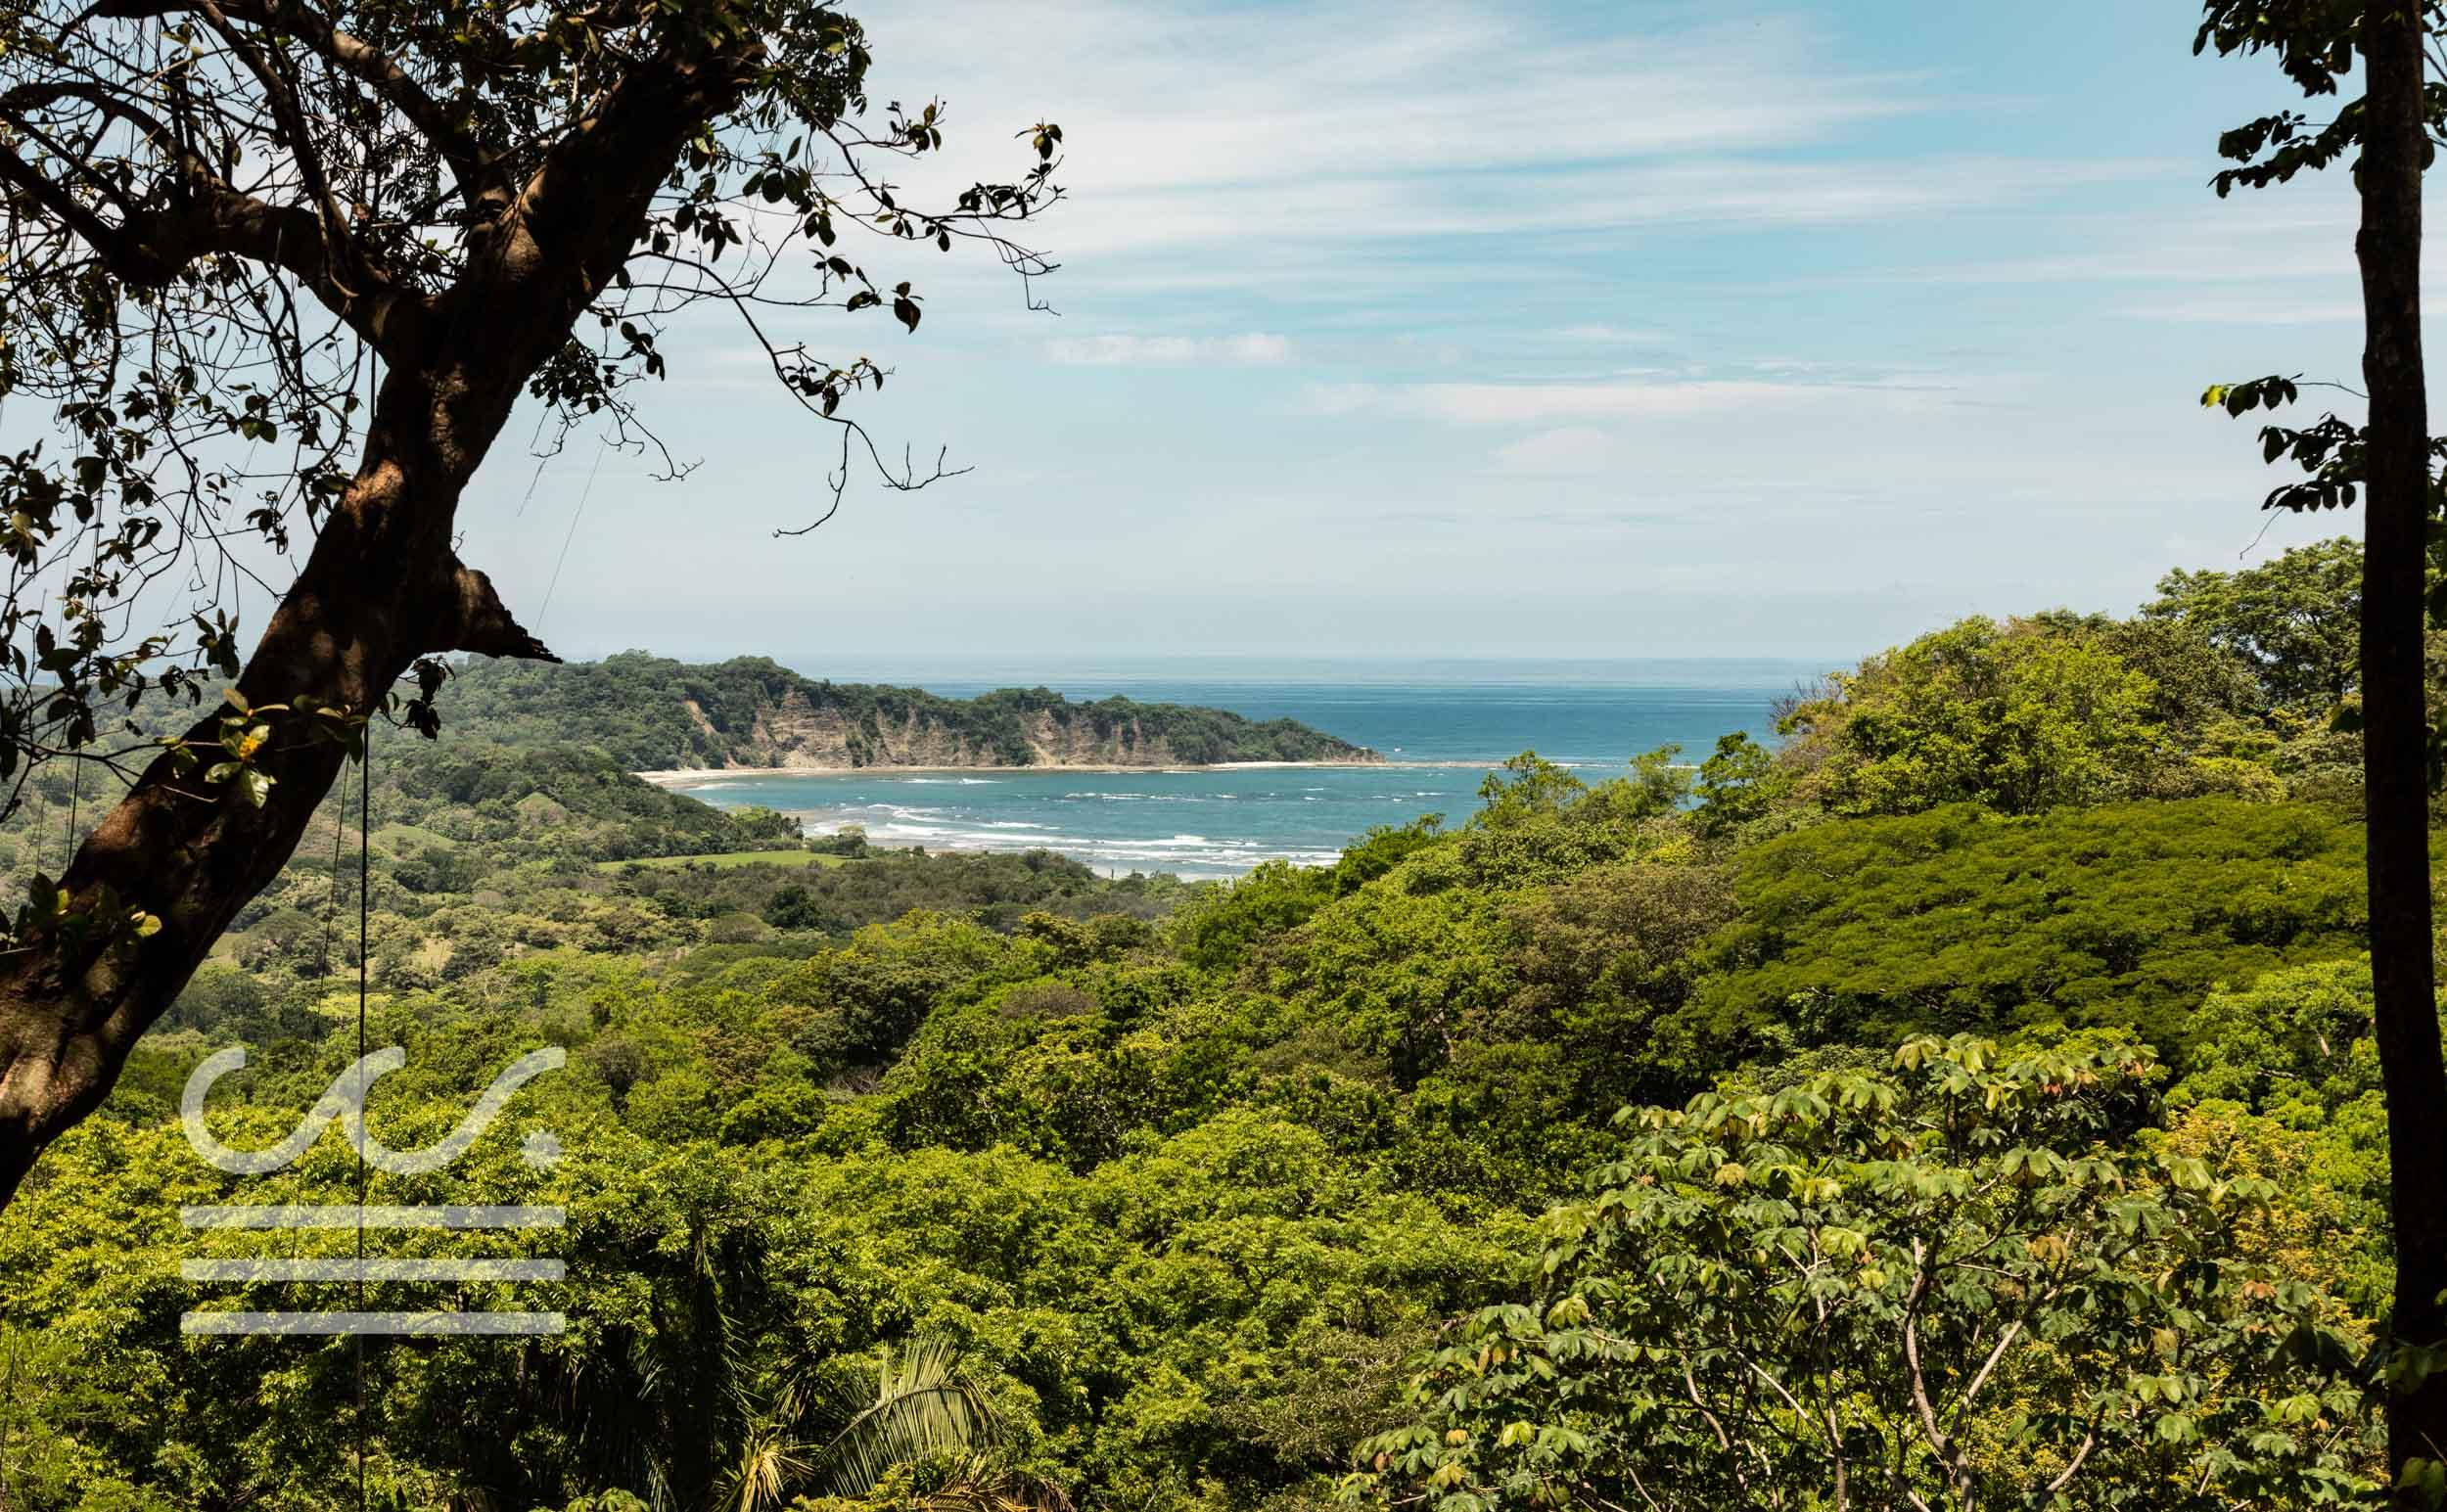 EE-102-Lot-Wanderlust-Realty-Real-Estate-Nosara-Costa-Rica-4.jpg